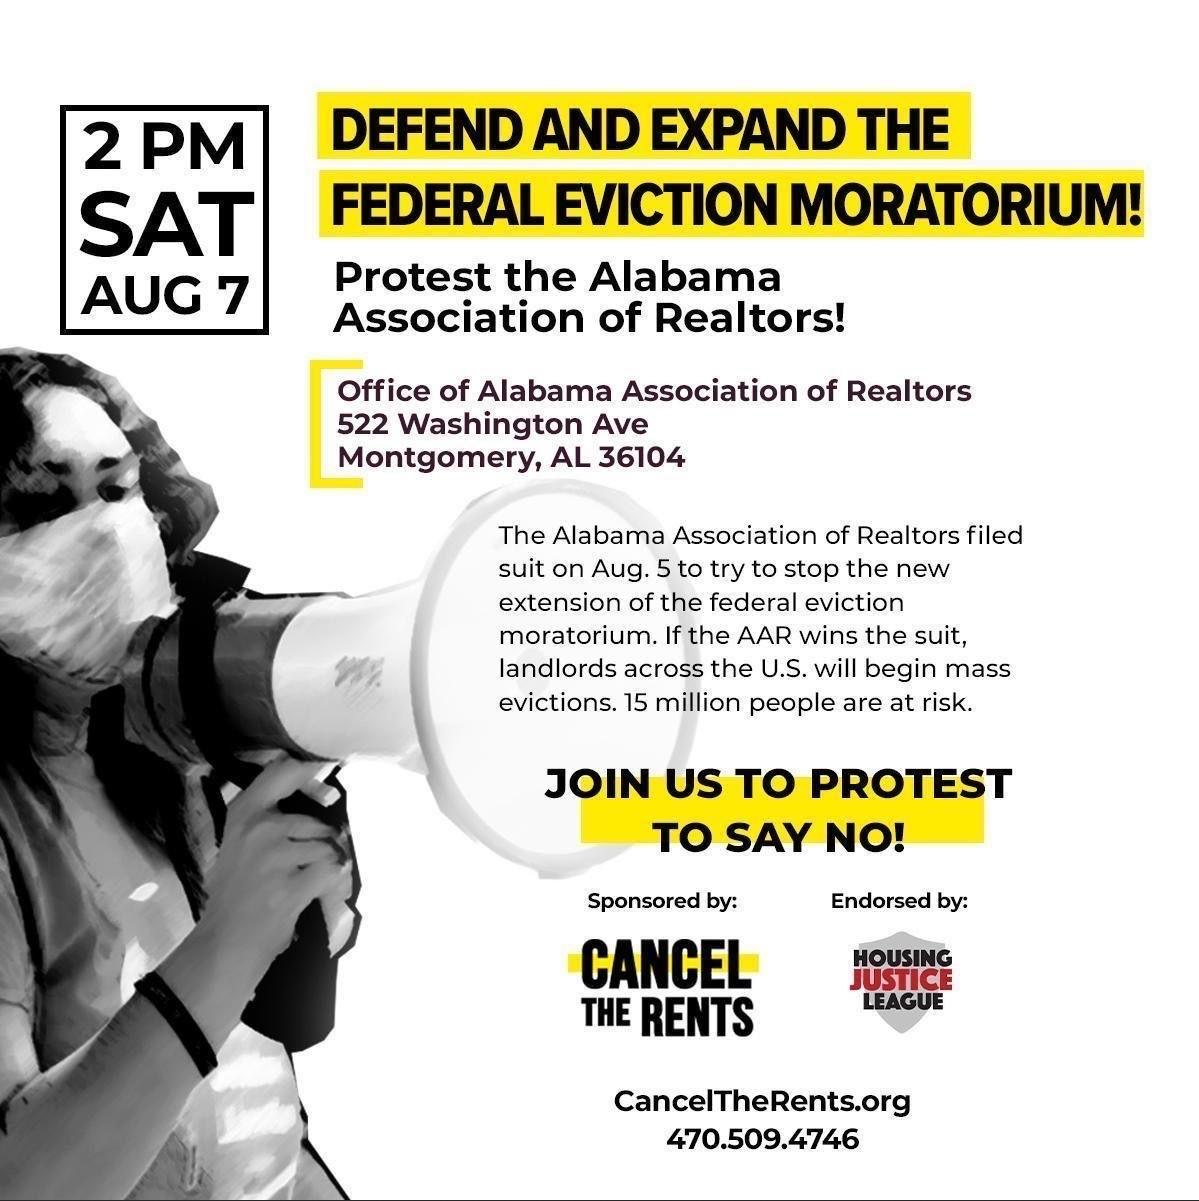 Aug 7 2021 - Protest against Alabama Association of Realtors